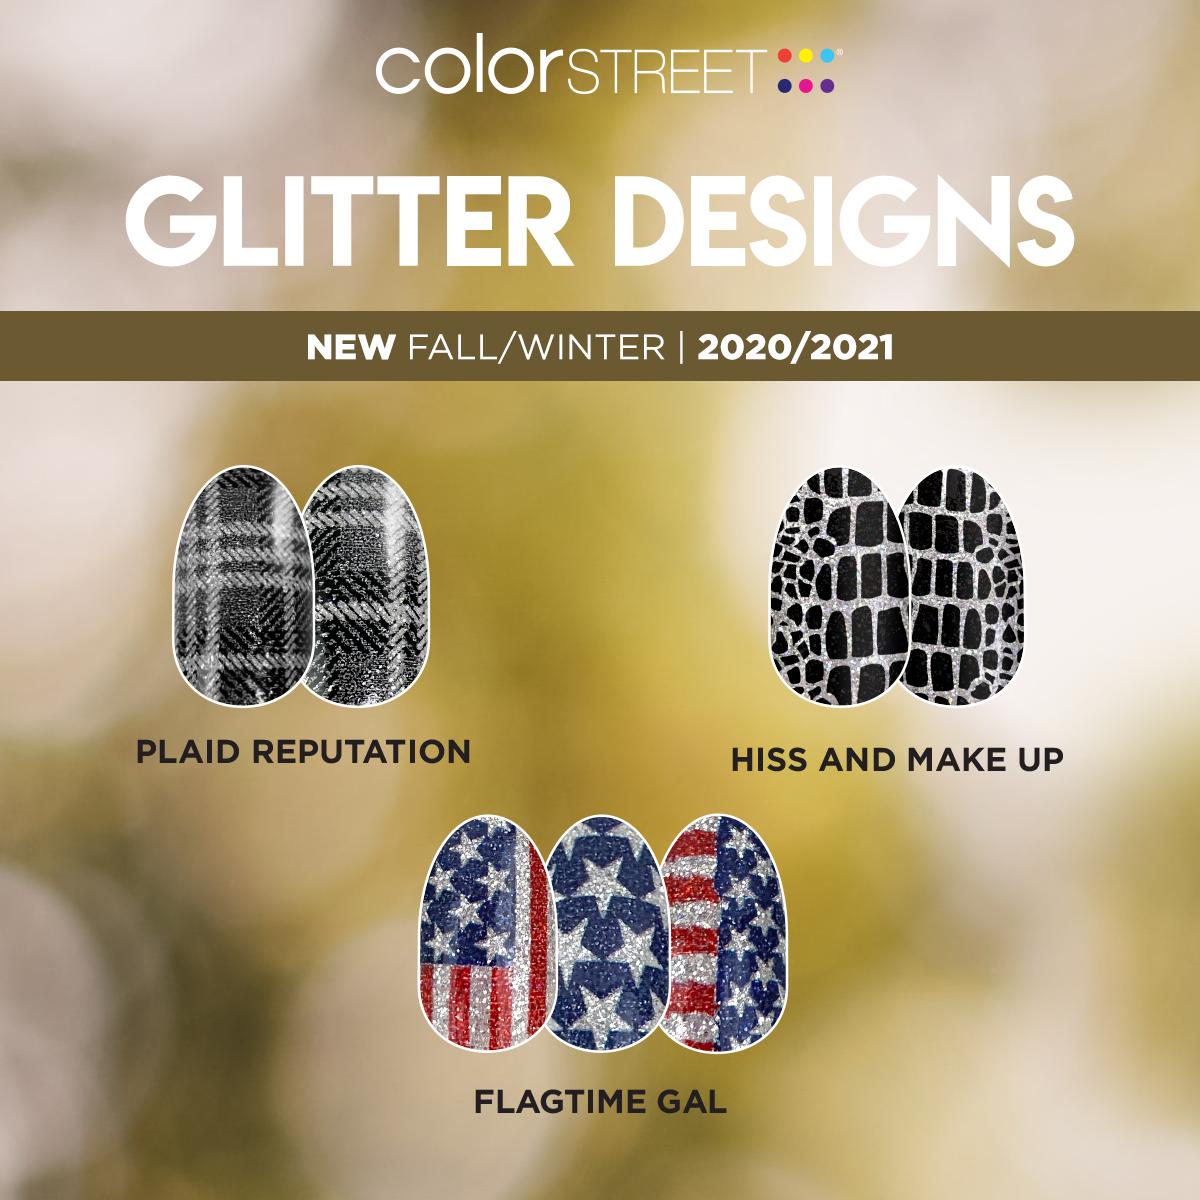 Color Street's Fall/Winter 2020 Glitter Designs